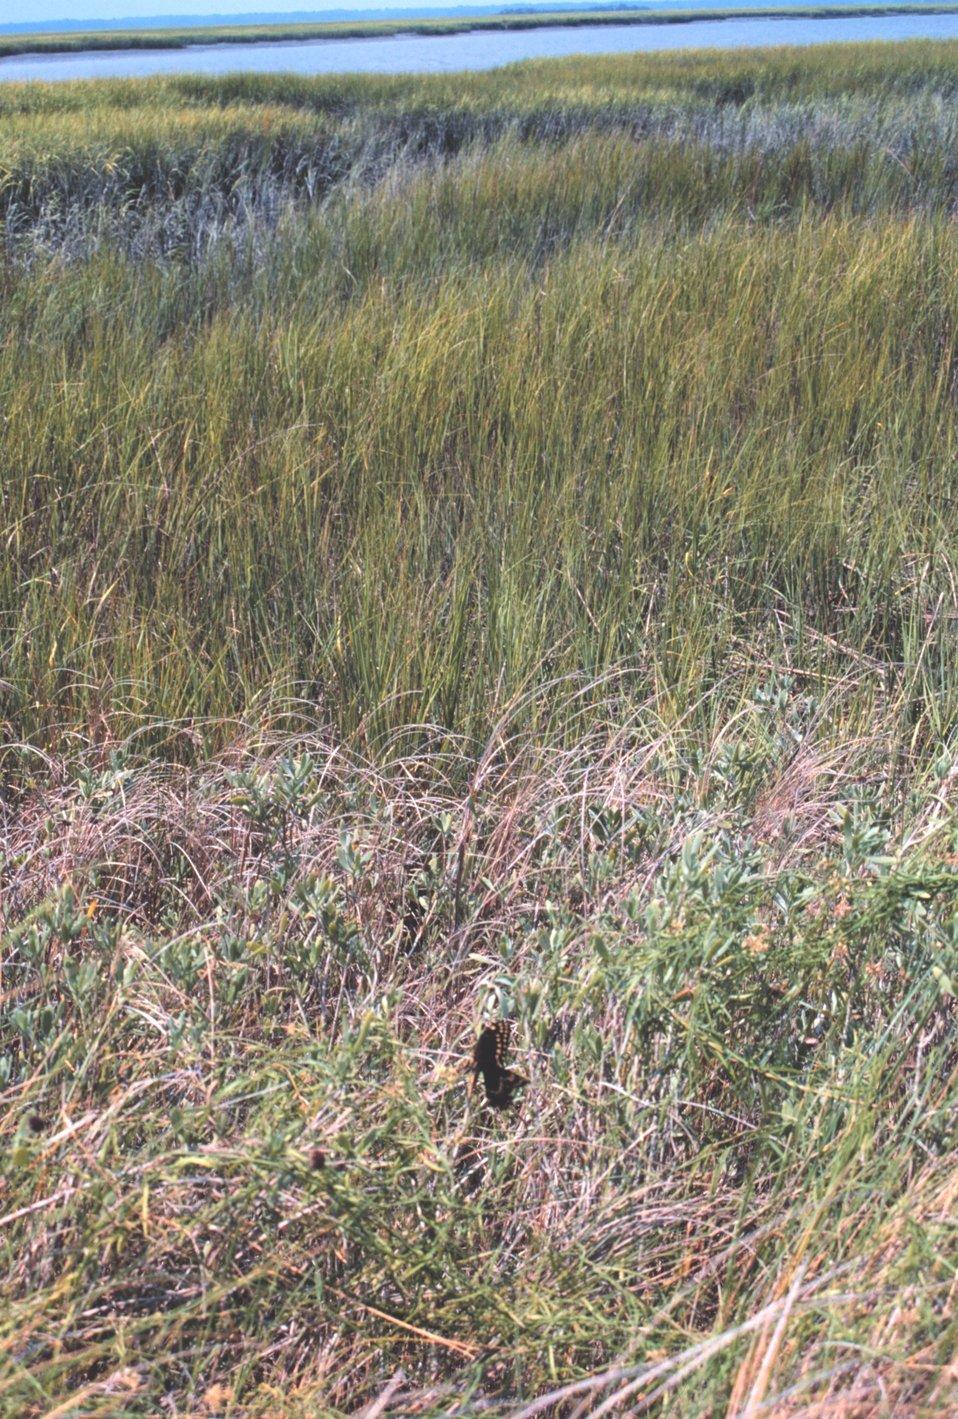 Sea grass and marsh